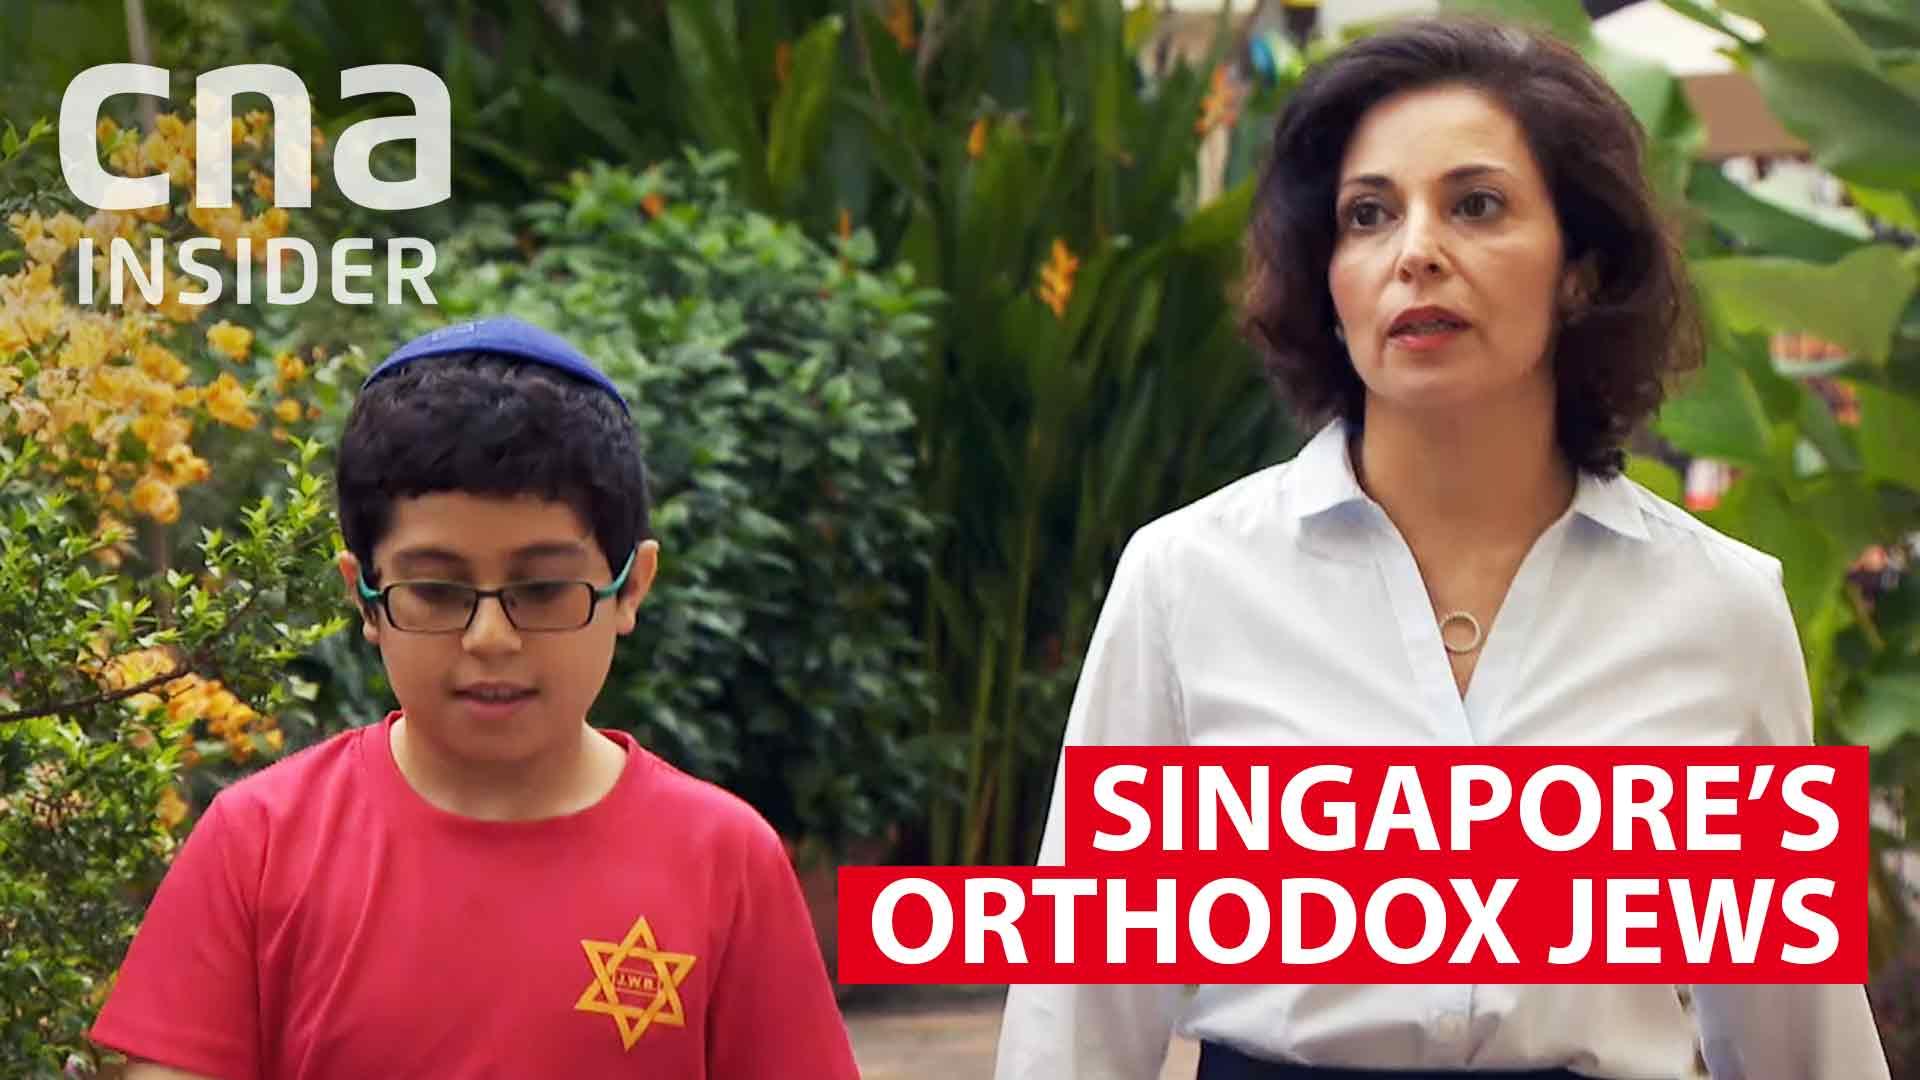 Singapore's Orthodox Jews